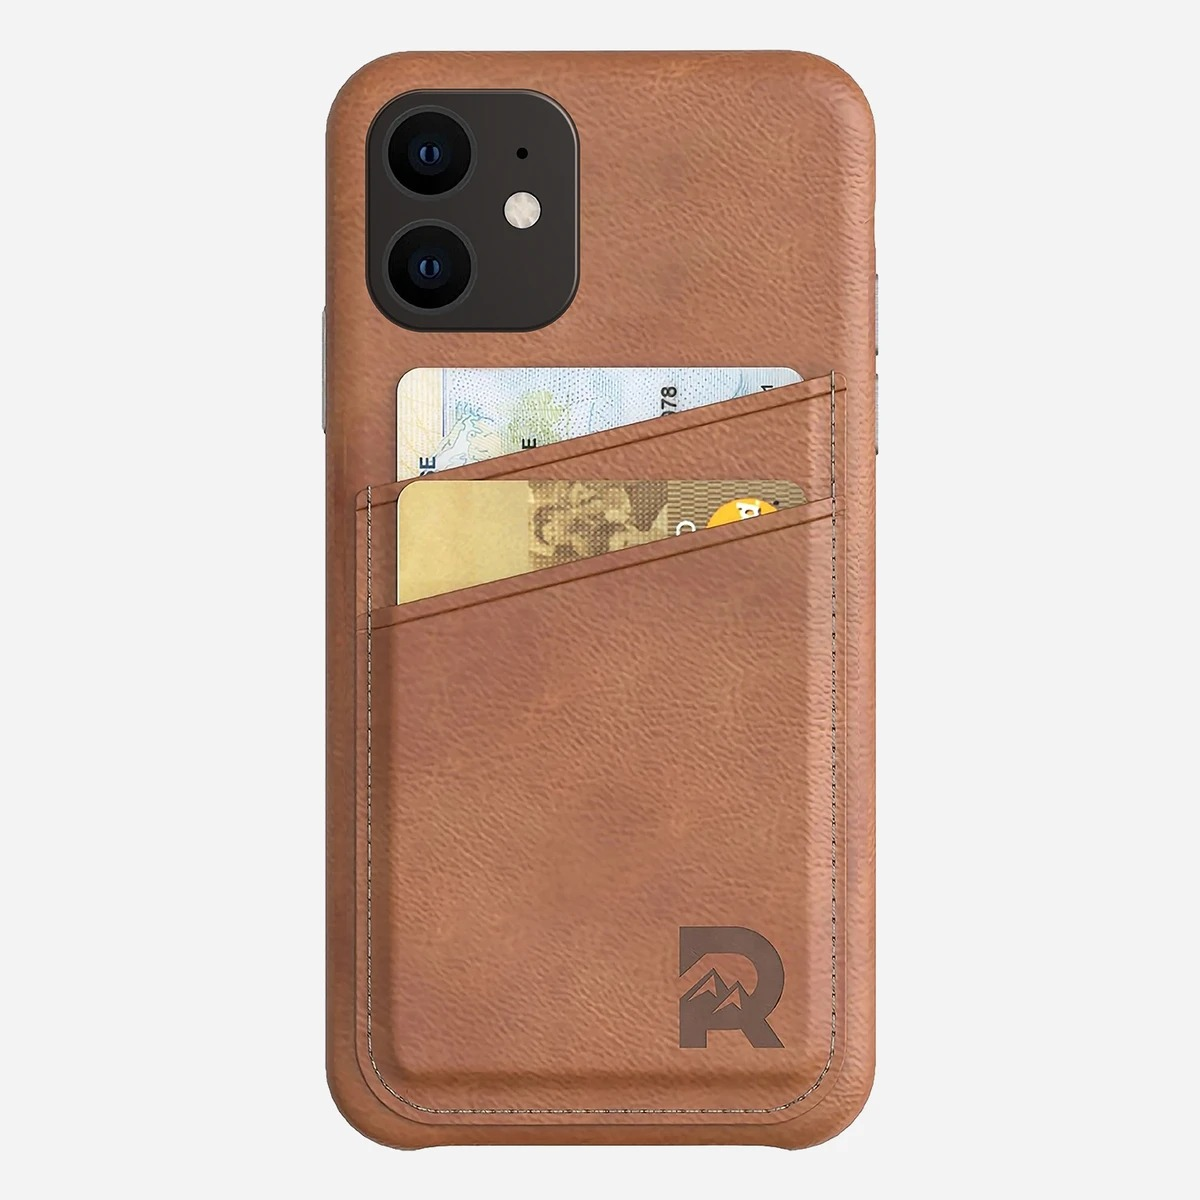 Ridge Card Case, best phone card holder